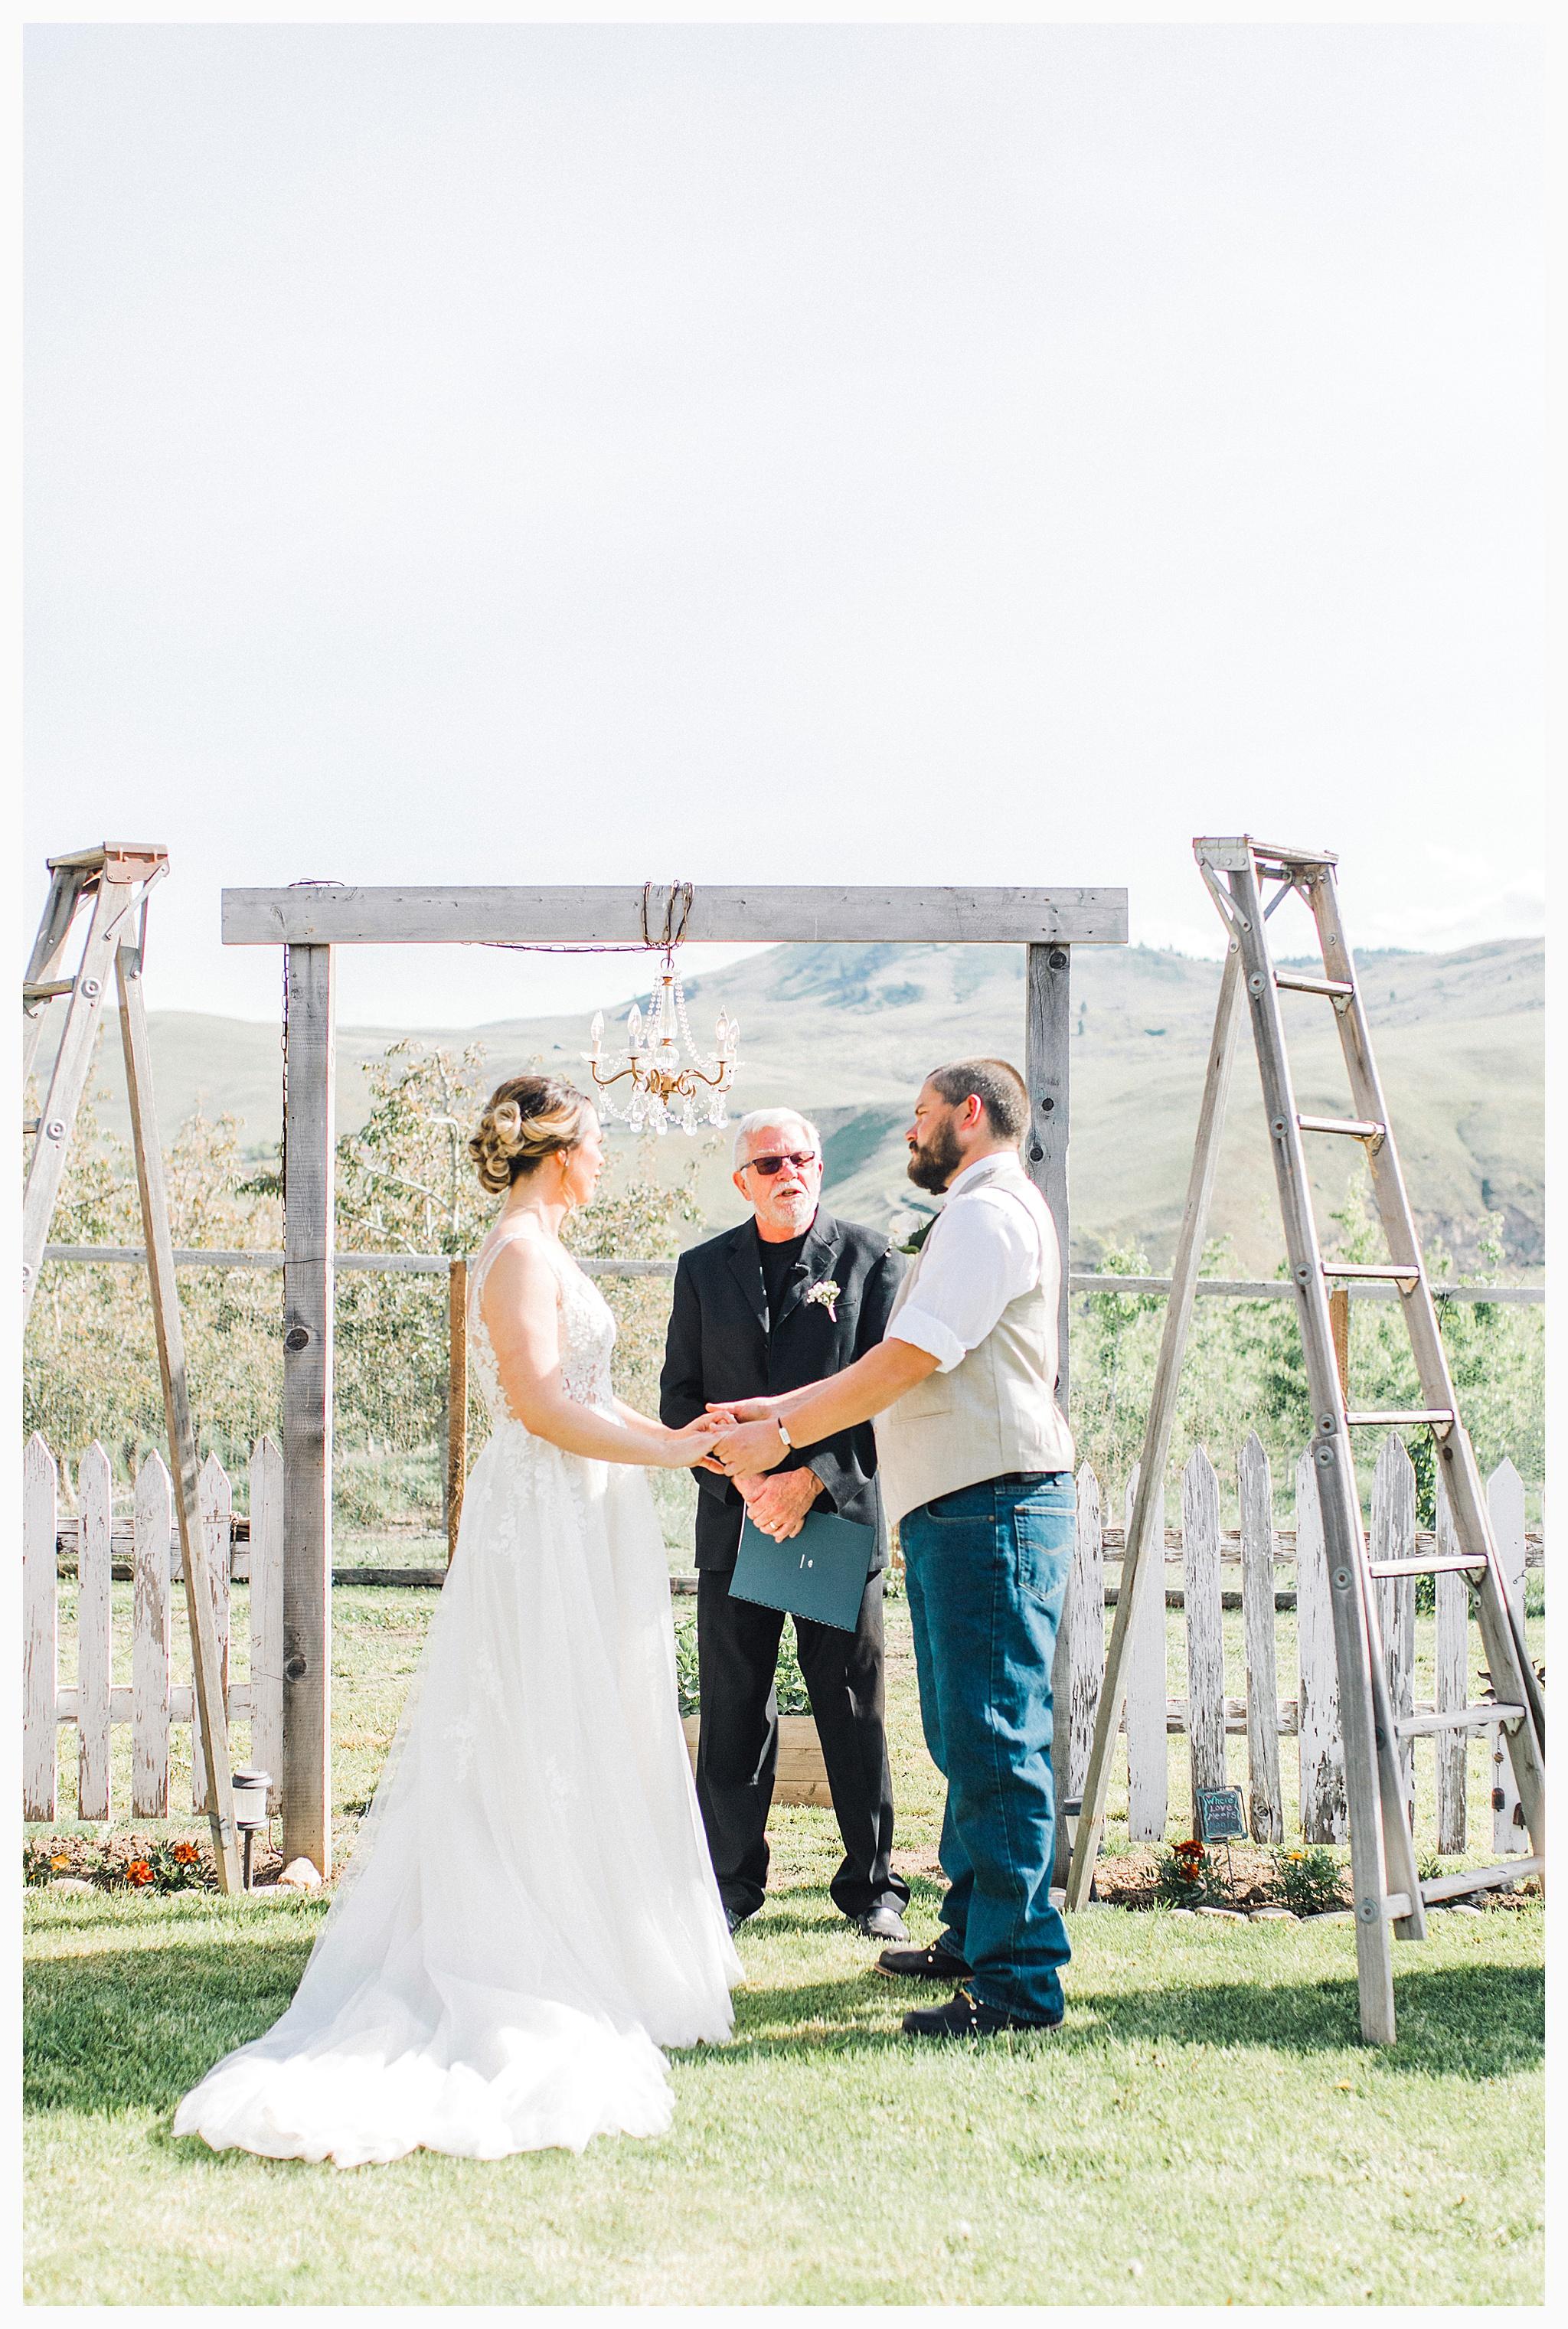 Rustic barn wedding in Wenatchee Washington at Sunshine Ranch on Easy Street, Emma Rose Company Seattle PNW Light and Airy Wedding Photographer_0062.jpg